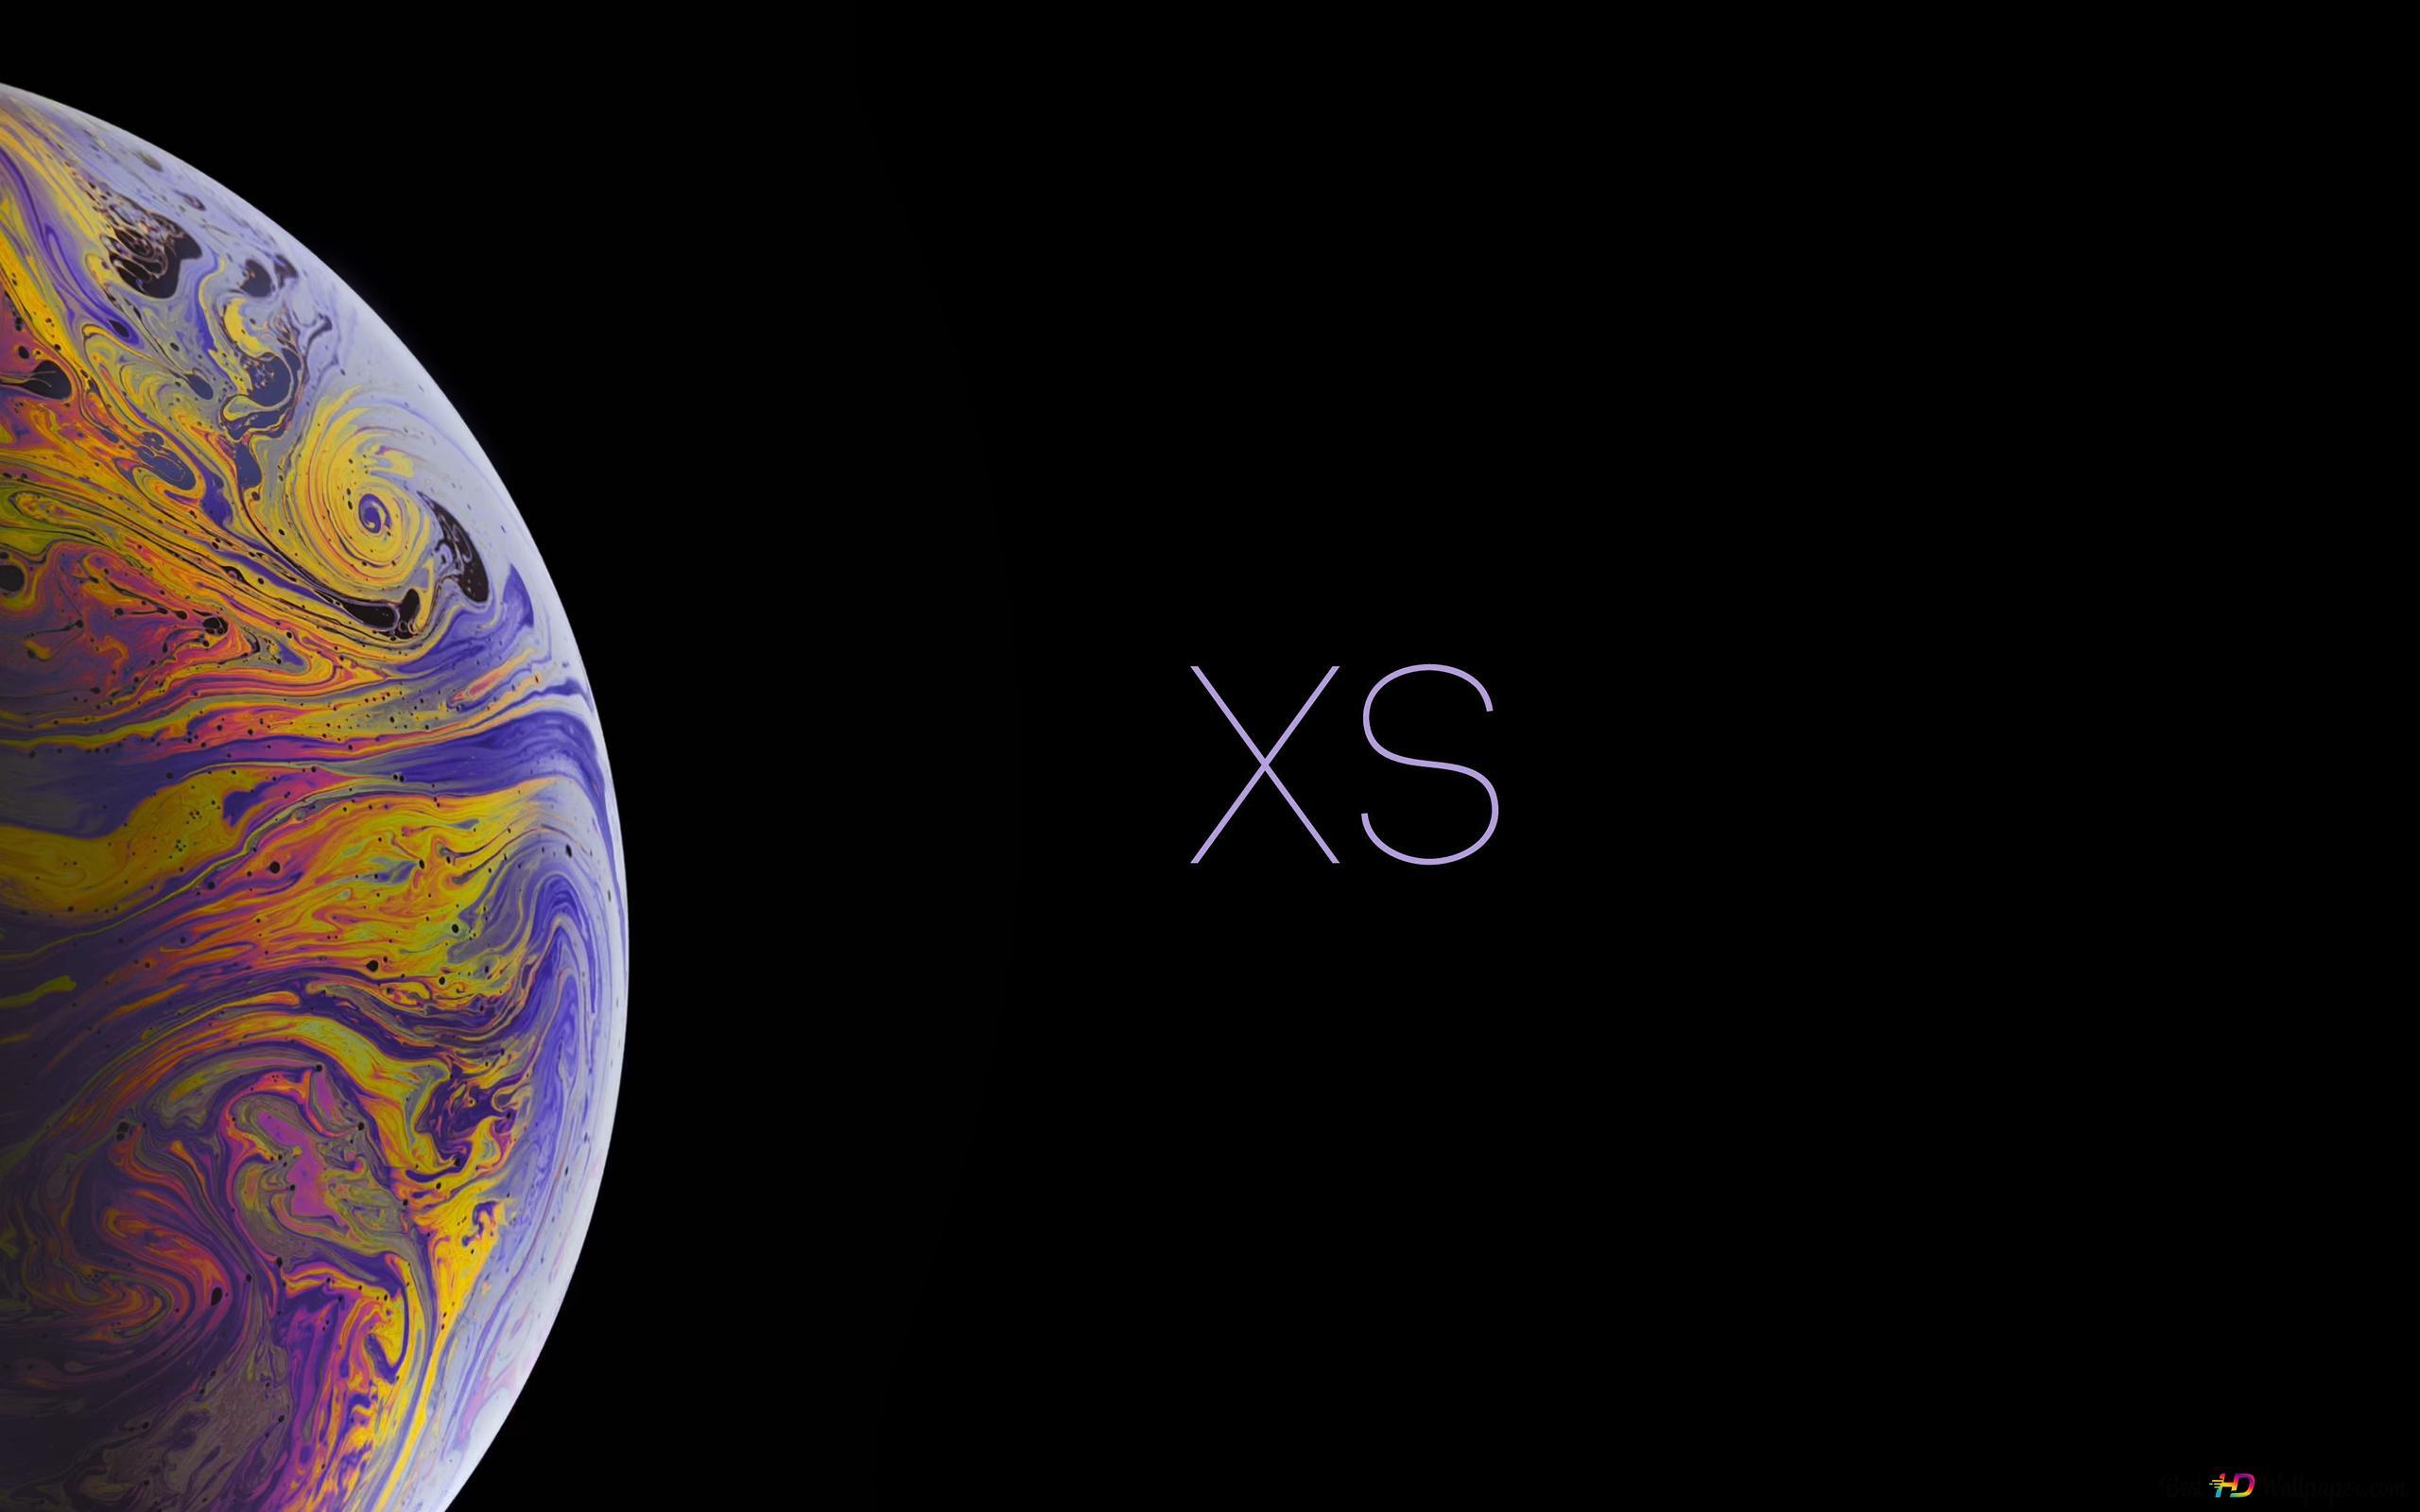 50 Great Sfondi Apple Iphone Xs Hd Sfondo